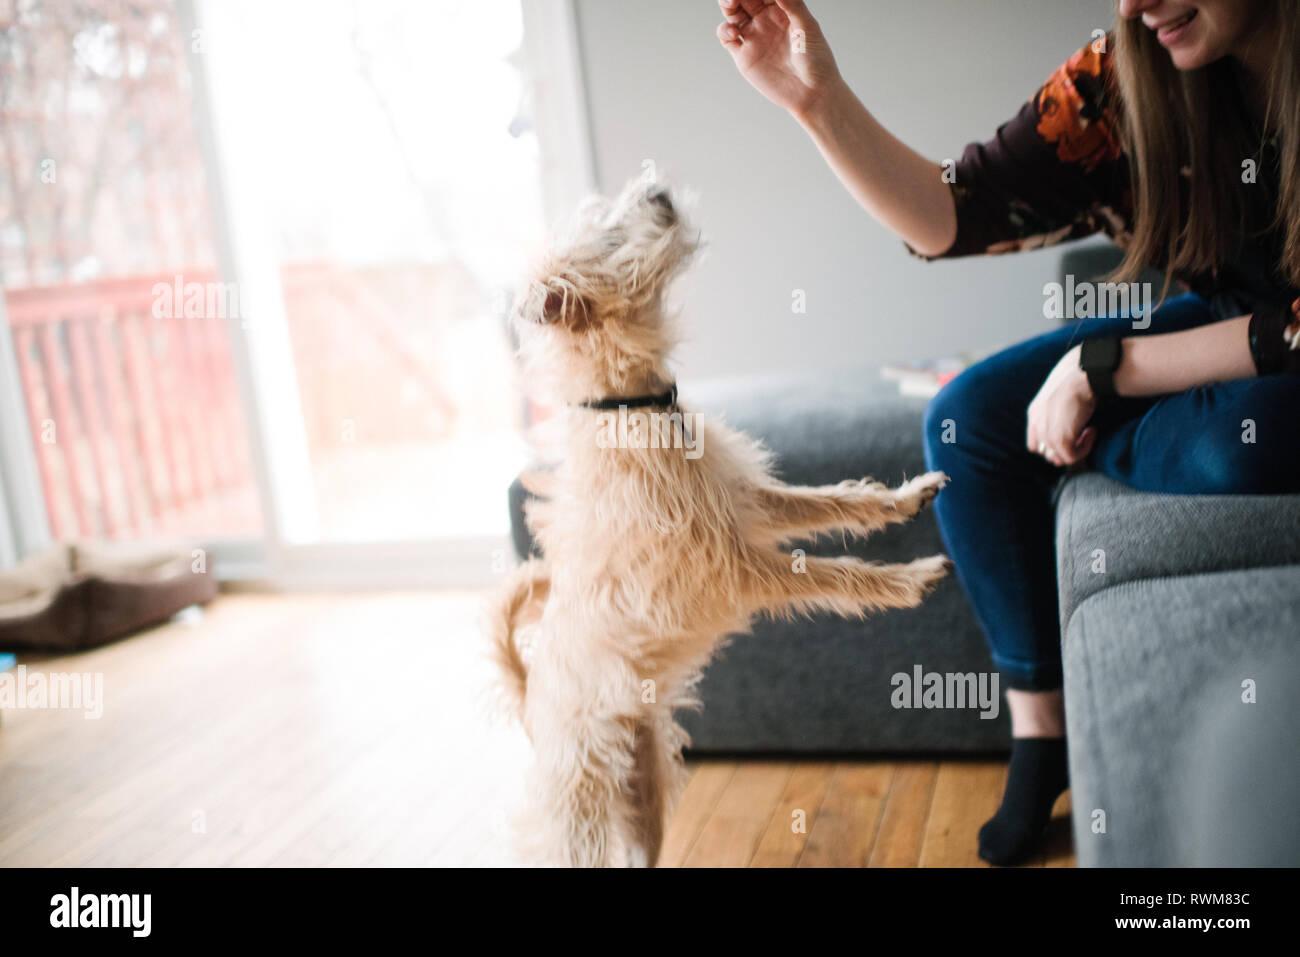 Woman giving dog training treat Stock Photo